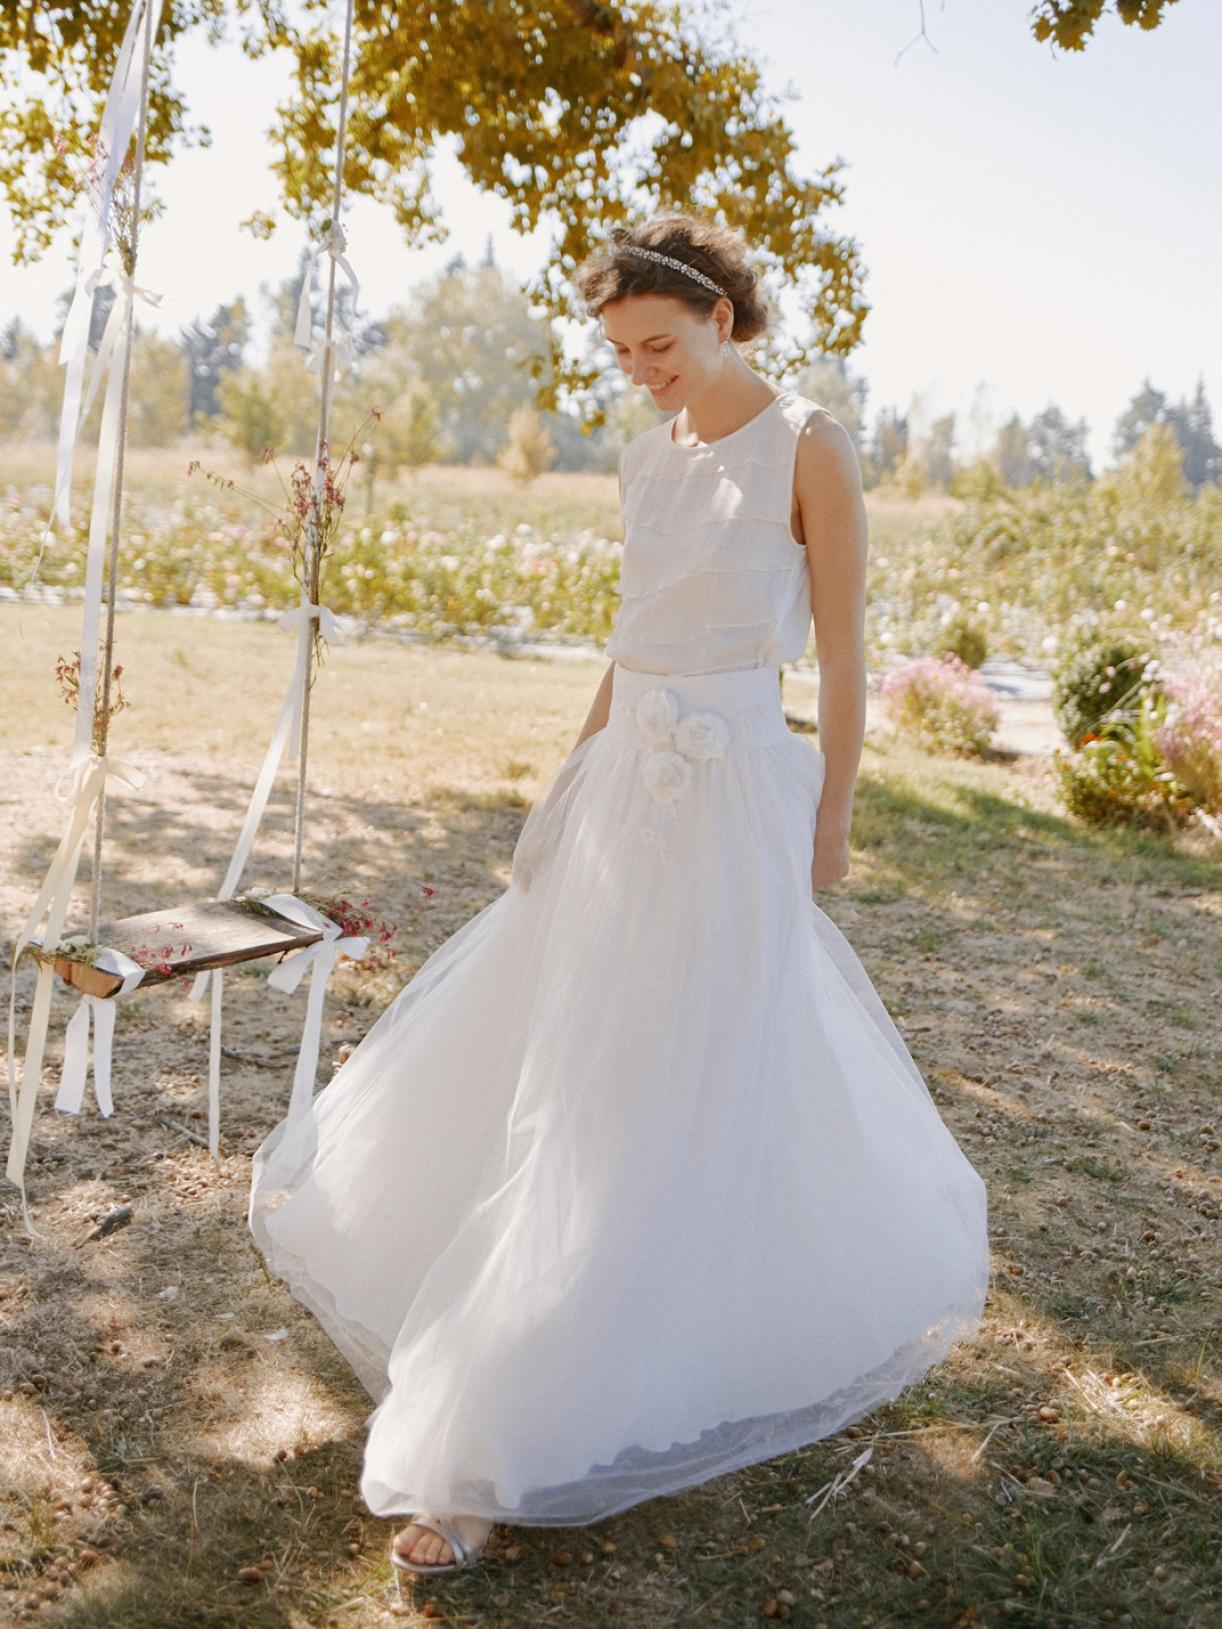 Robe de mariee princesse tulle ecoresponsable - Creatrice mariee Paris - Myphilosophy